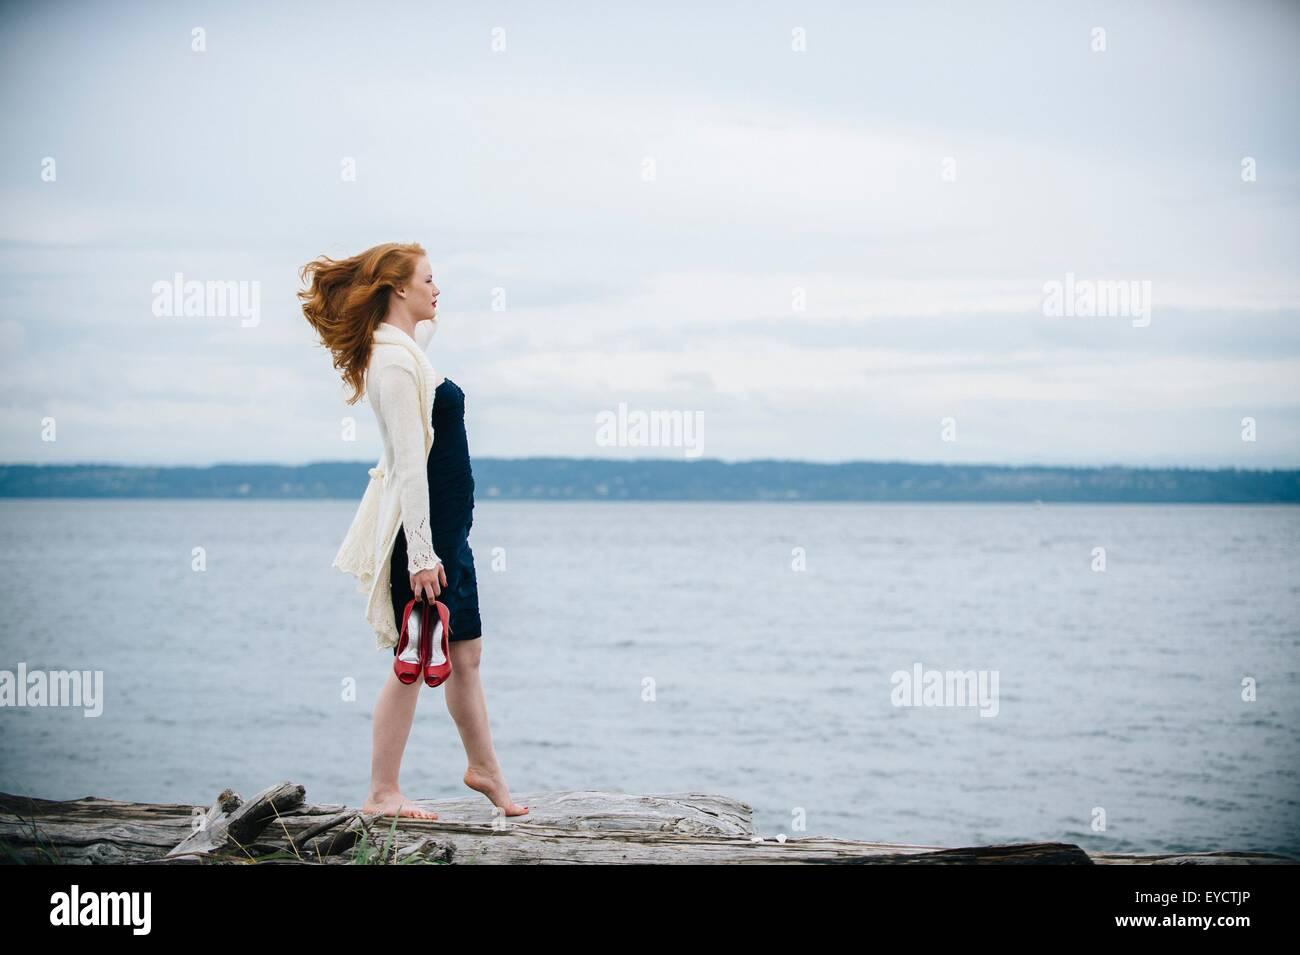 Junge Frau am Strand mit Blick auf Meer, Bainbridge Island, Washington State, USA Stockbild